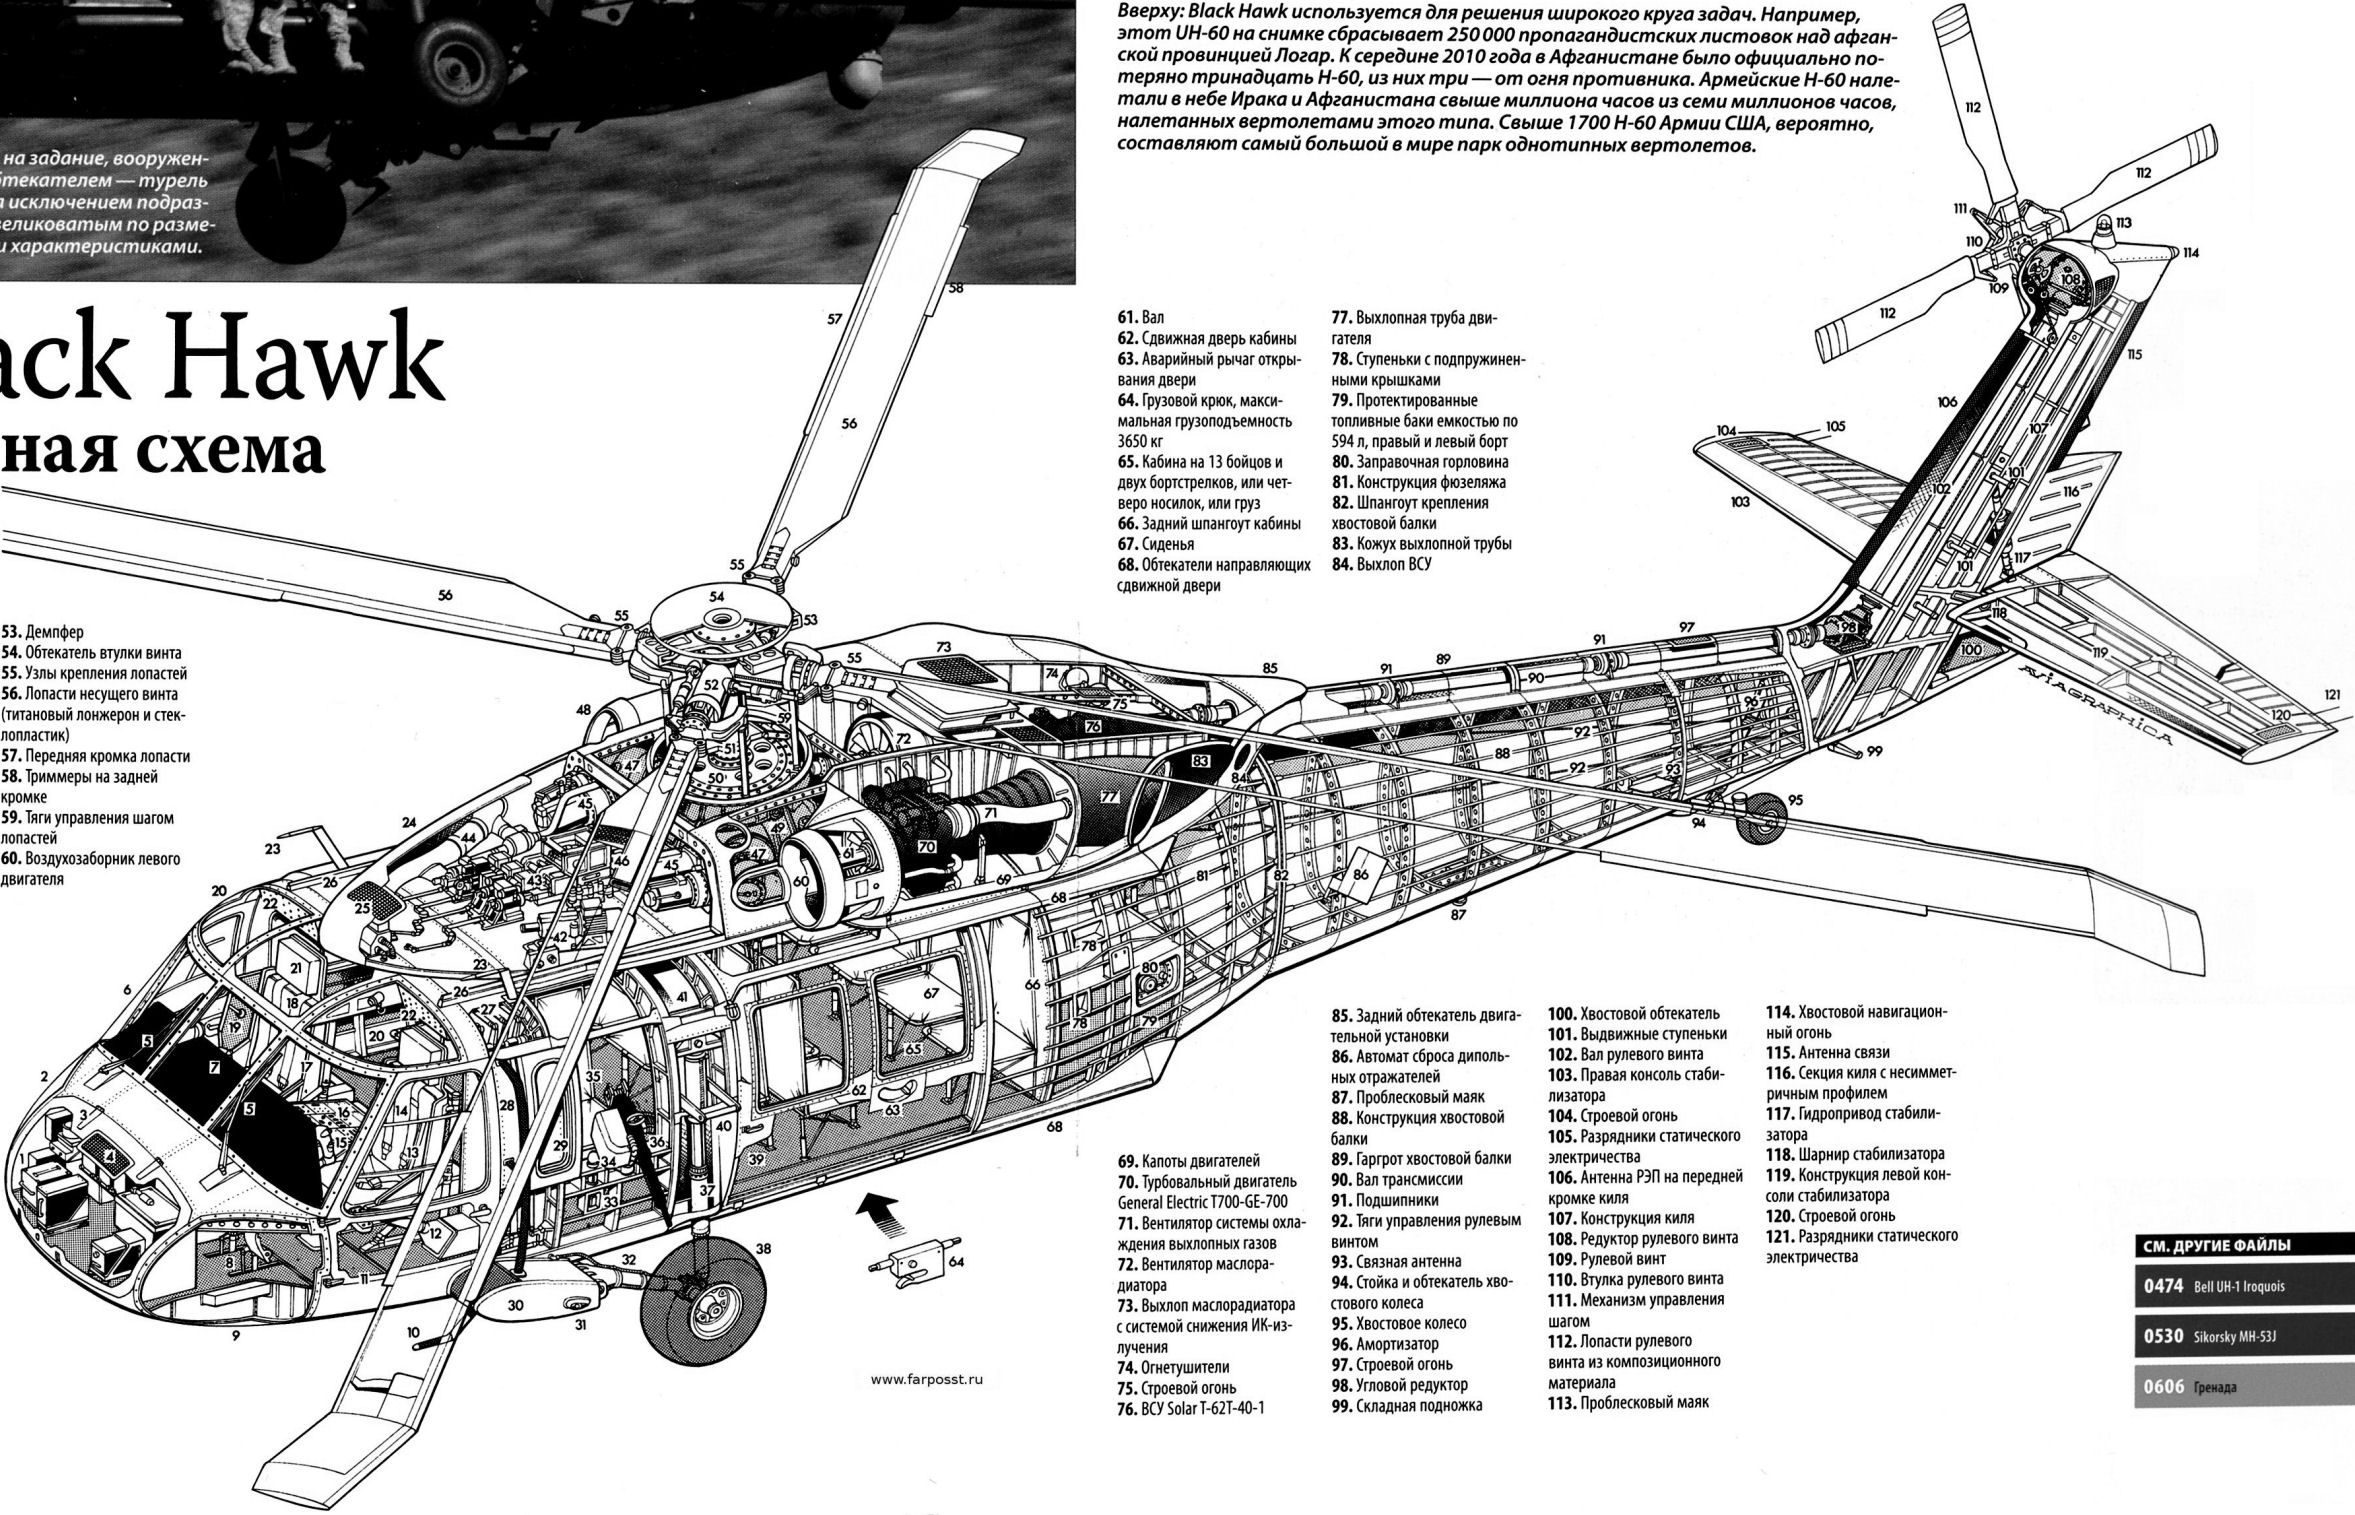 Blackhawk Helicopter Blueprint Images